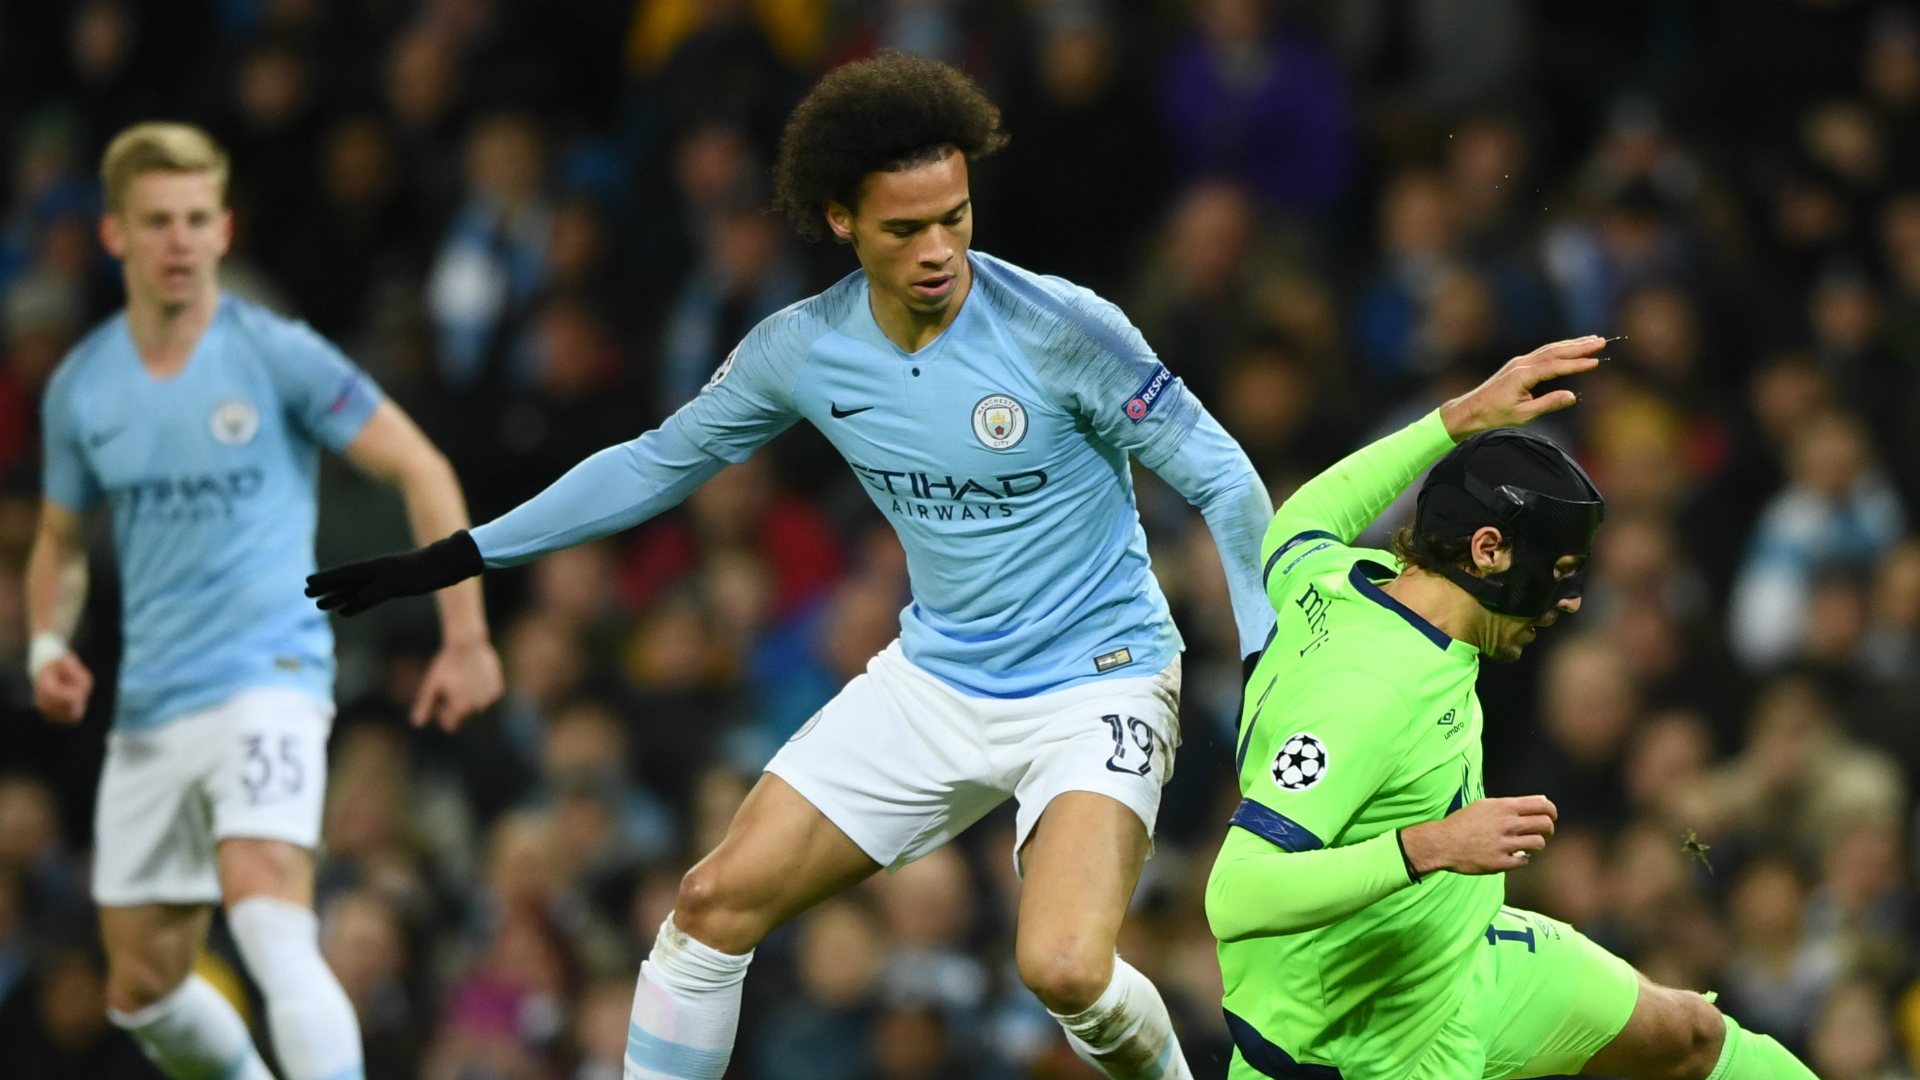 Guardiola savours City depth after Sane stuns Schalke